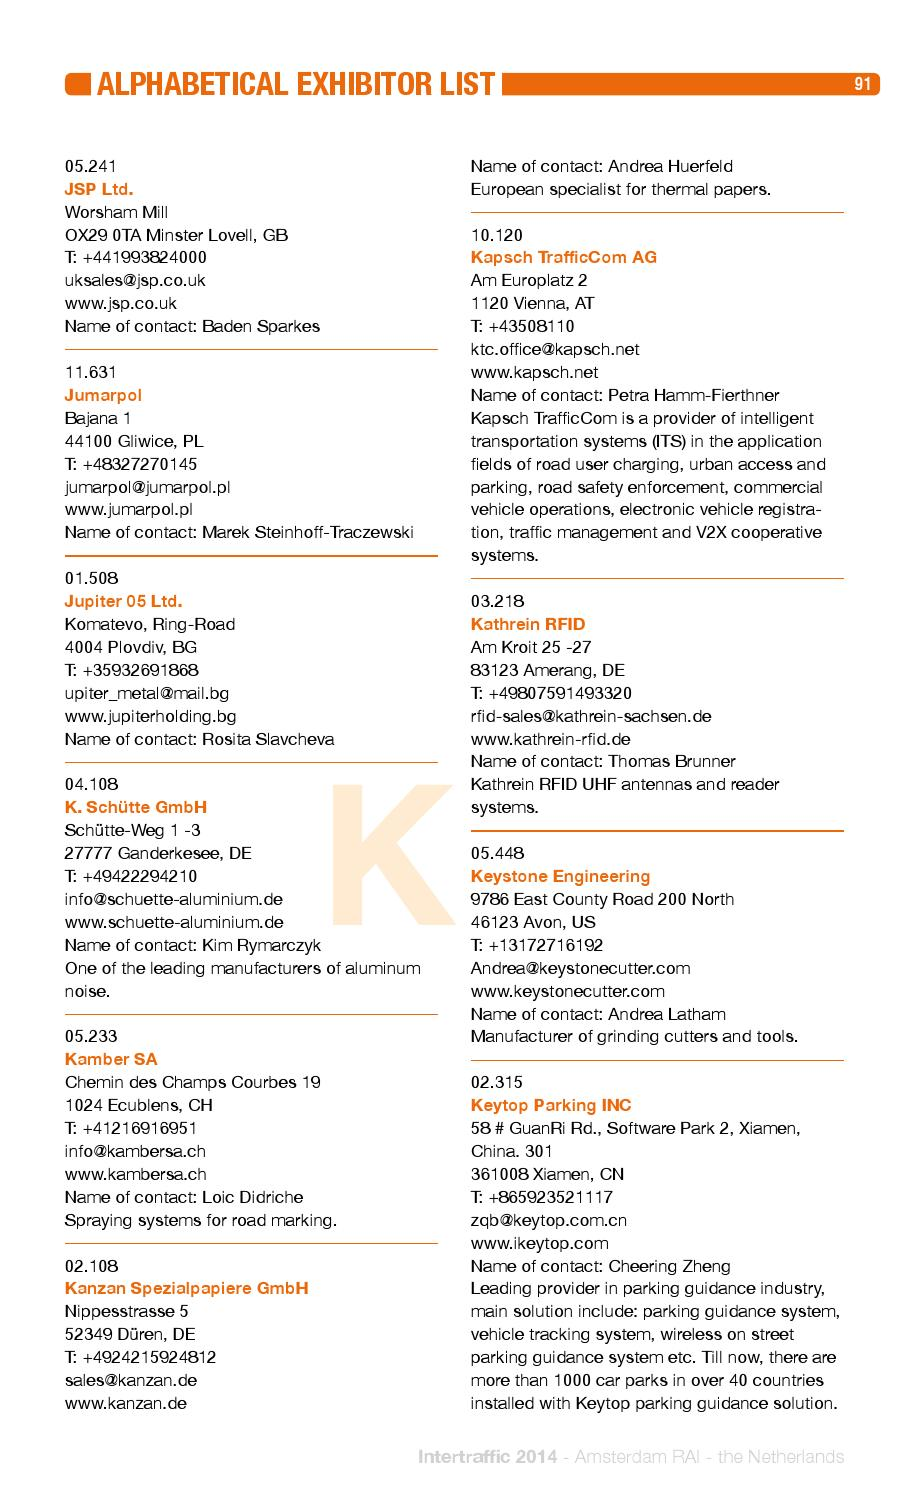 Intertraffic 2014 catalogue